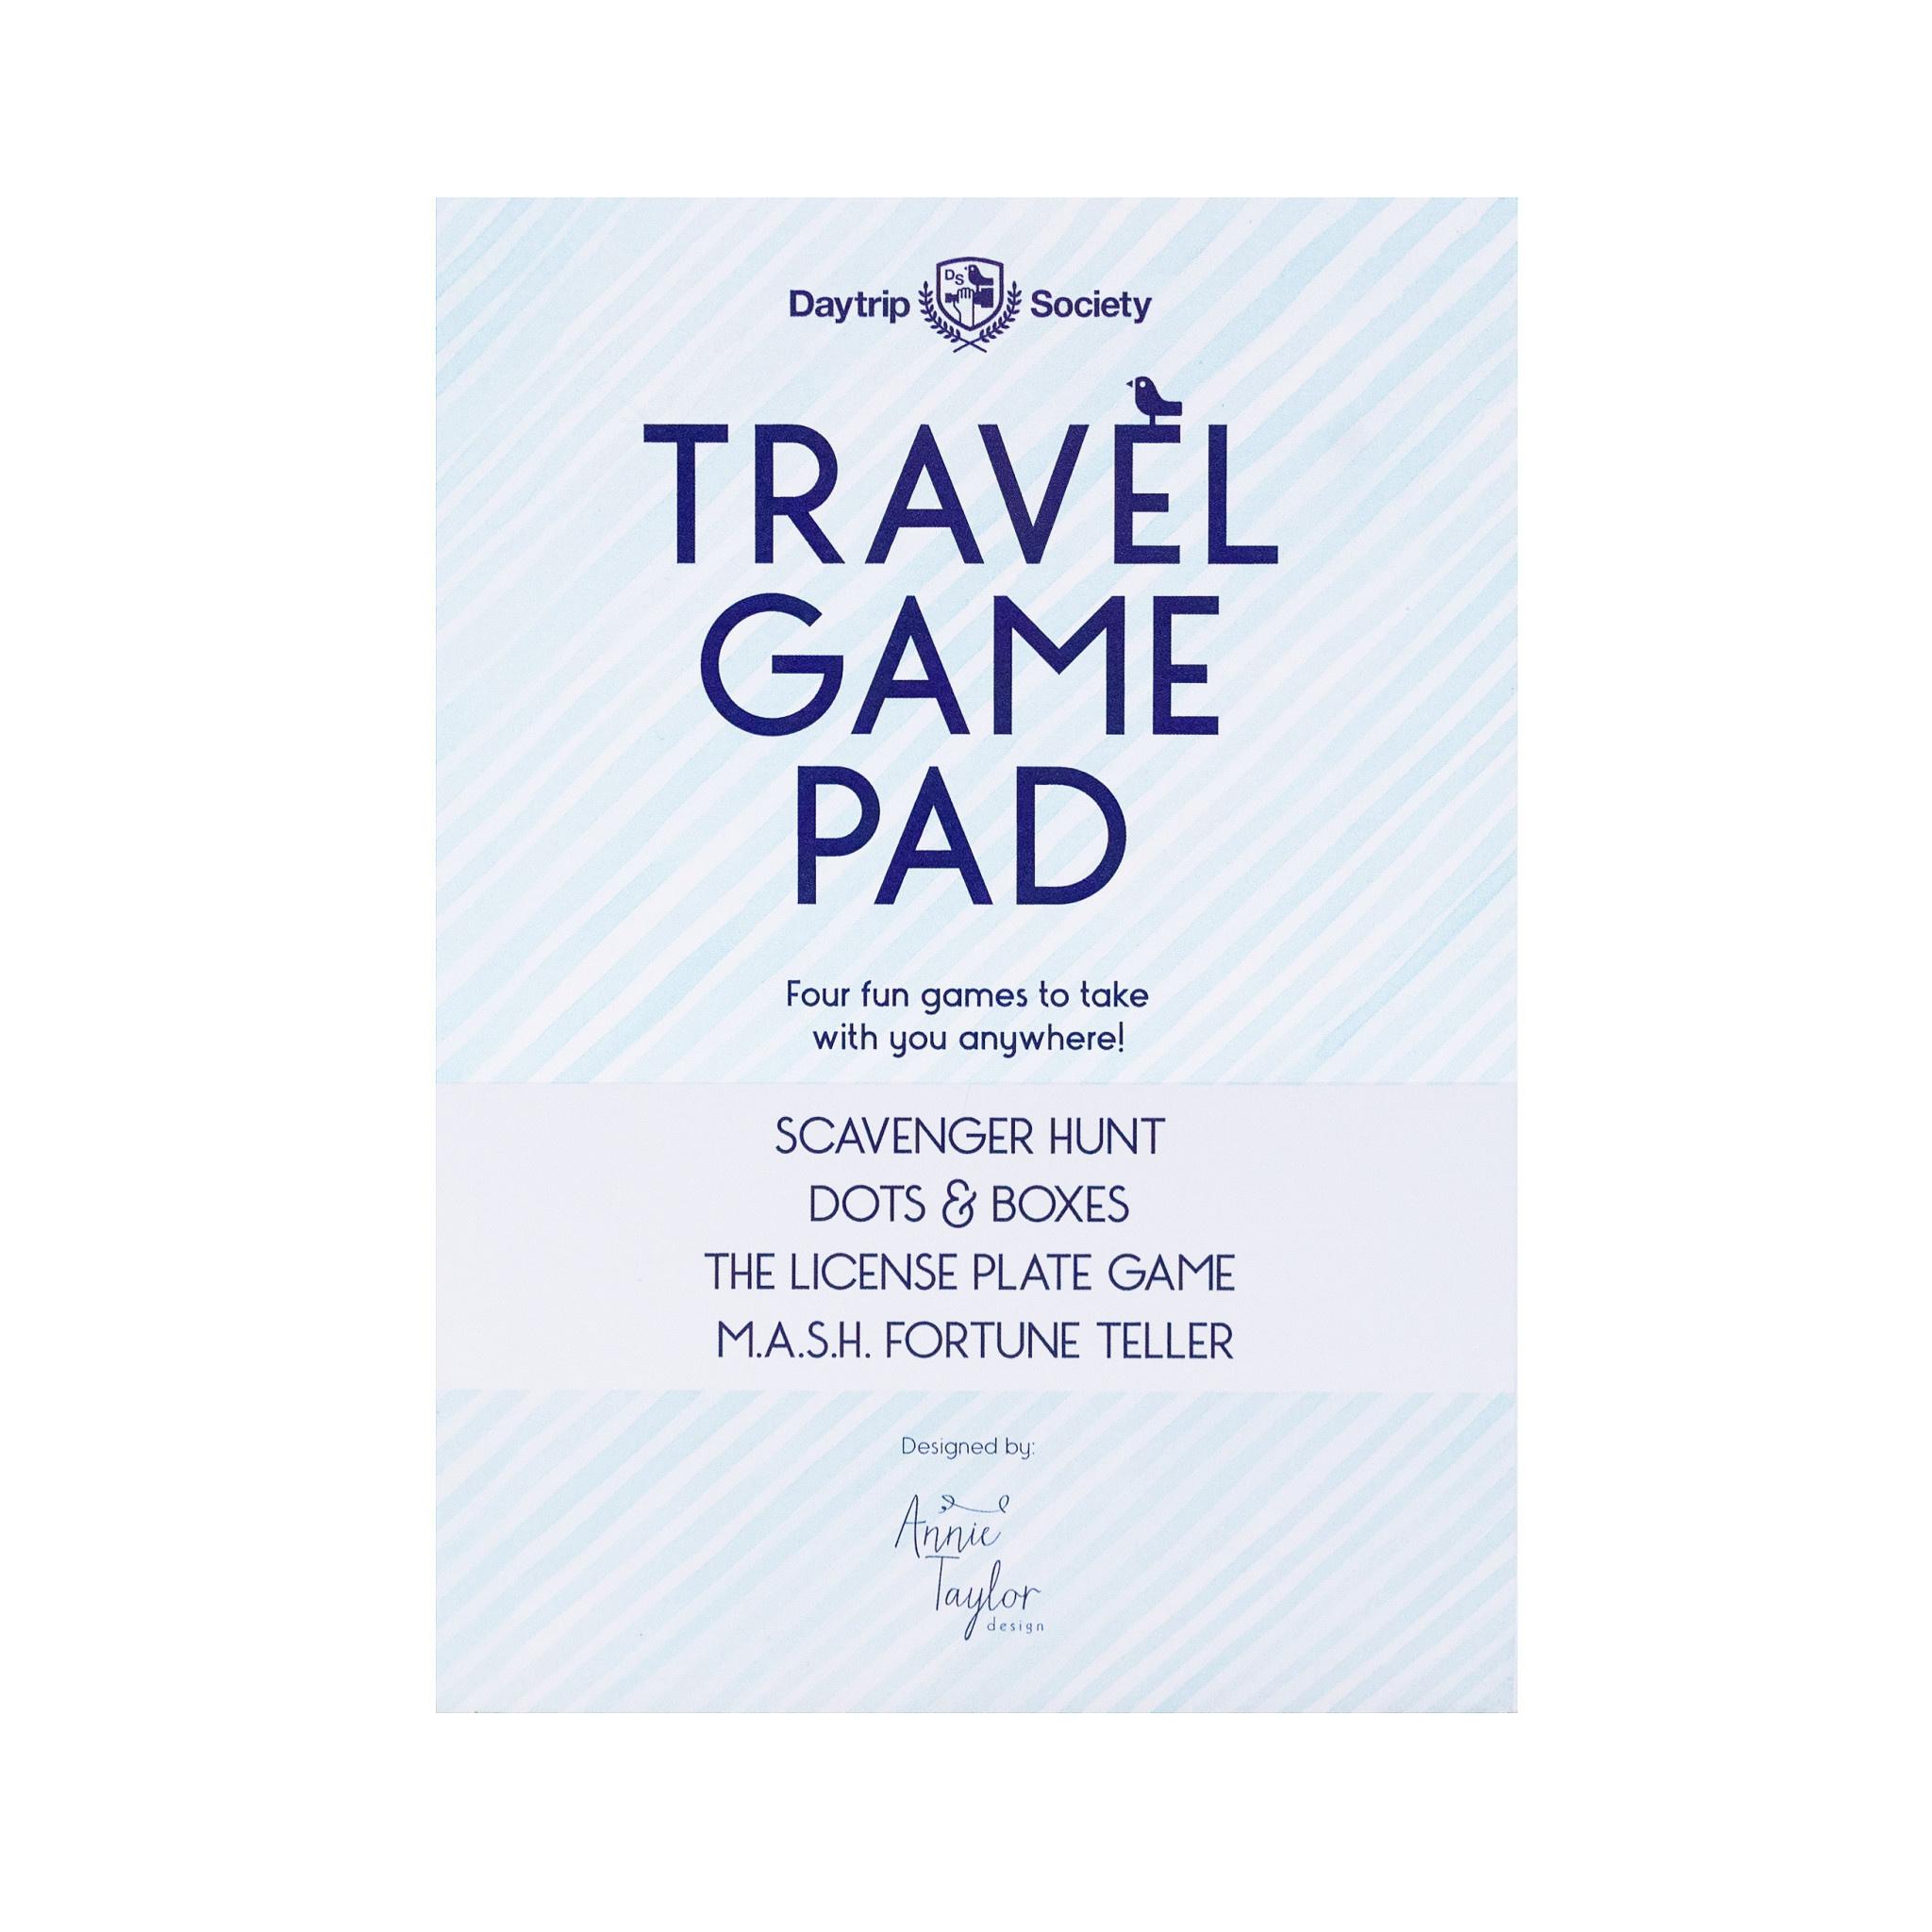 Annie Taylor Design Daytrip Society Travel Game Pad